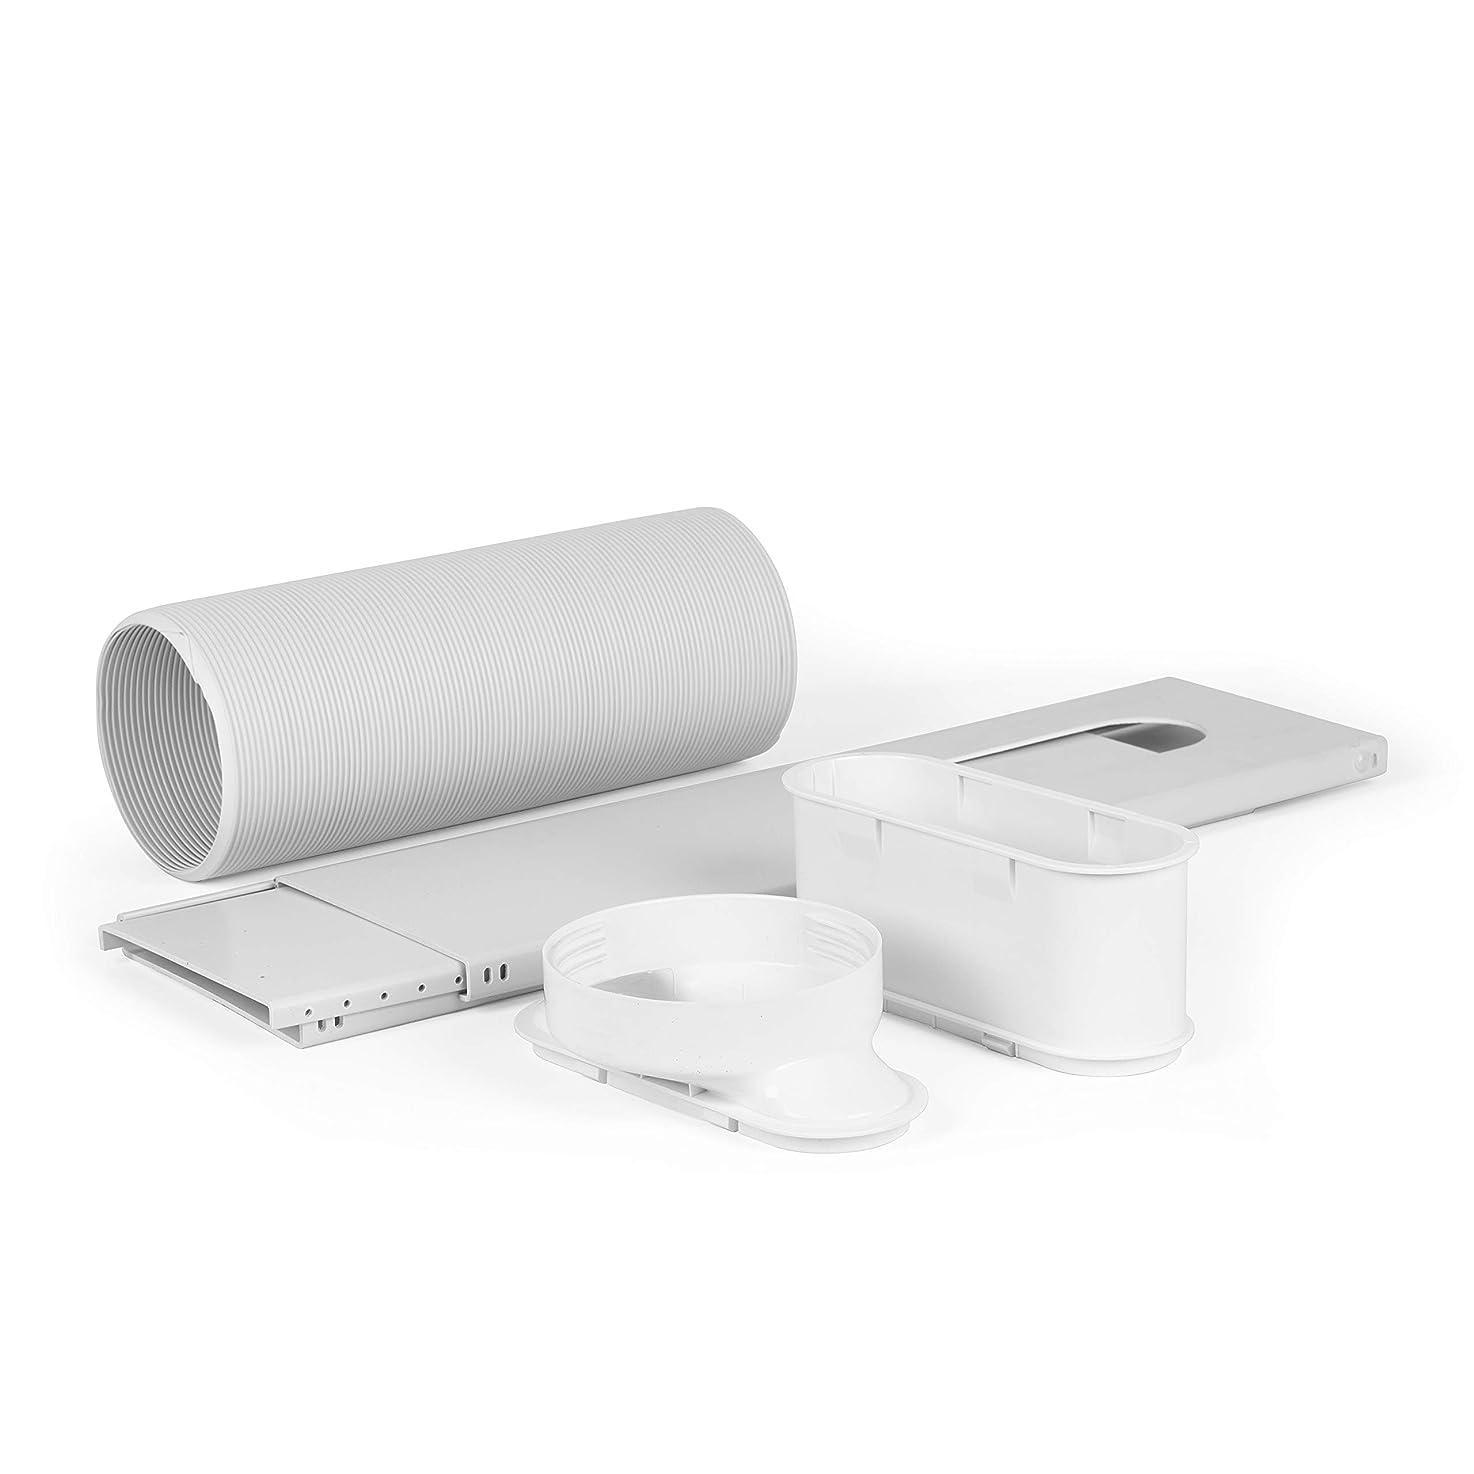 Portable Air Conditioner Accessories (Window Kit Accessory), ANYAIR ajwcdrnsjffsq1